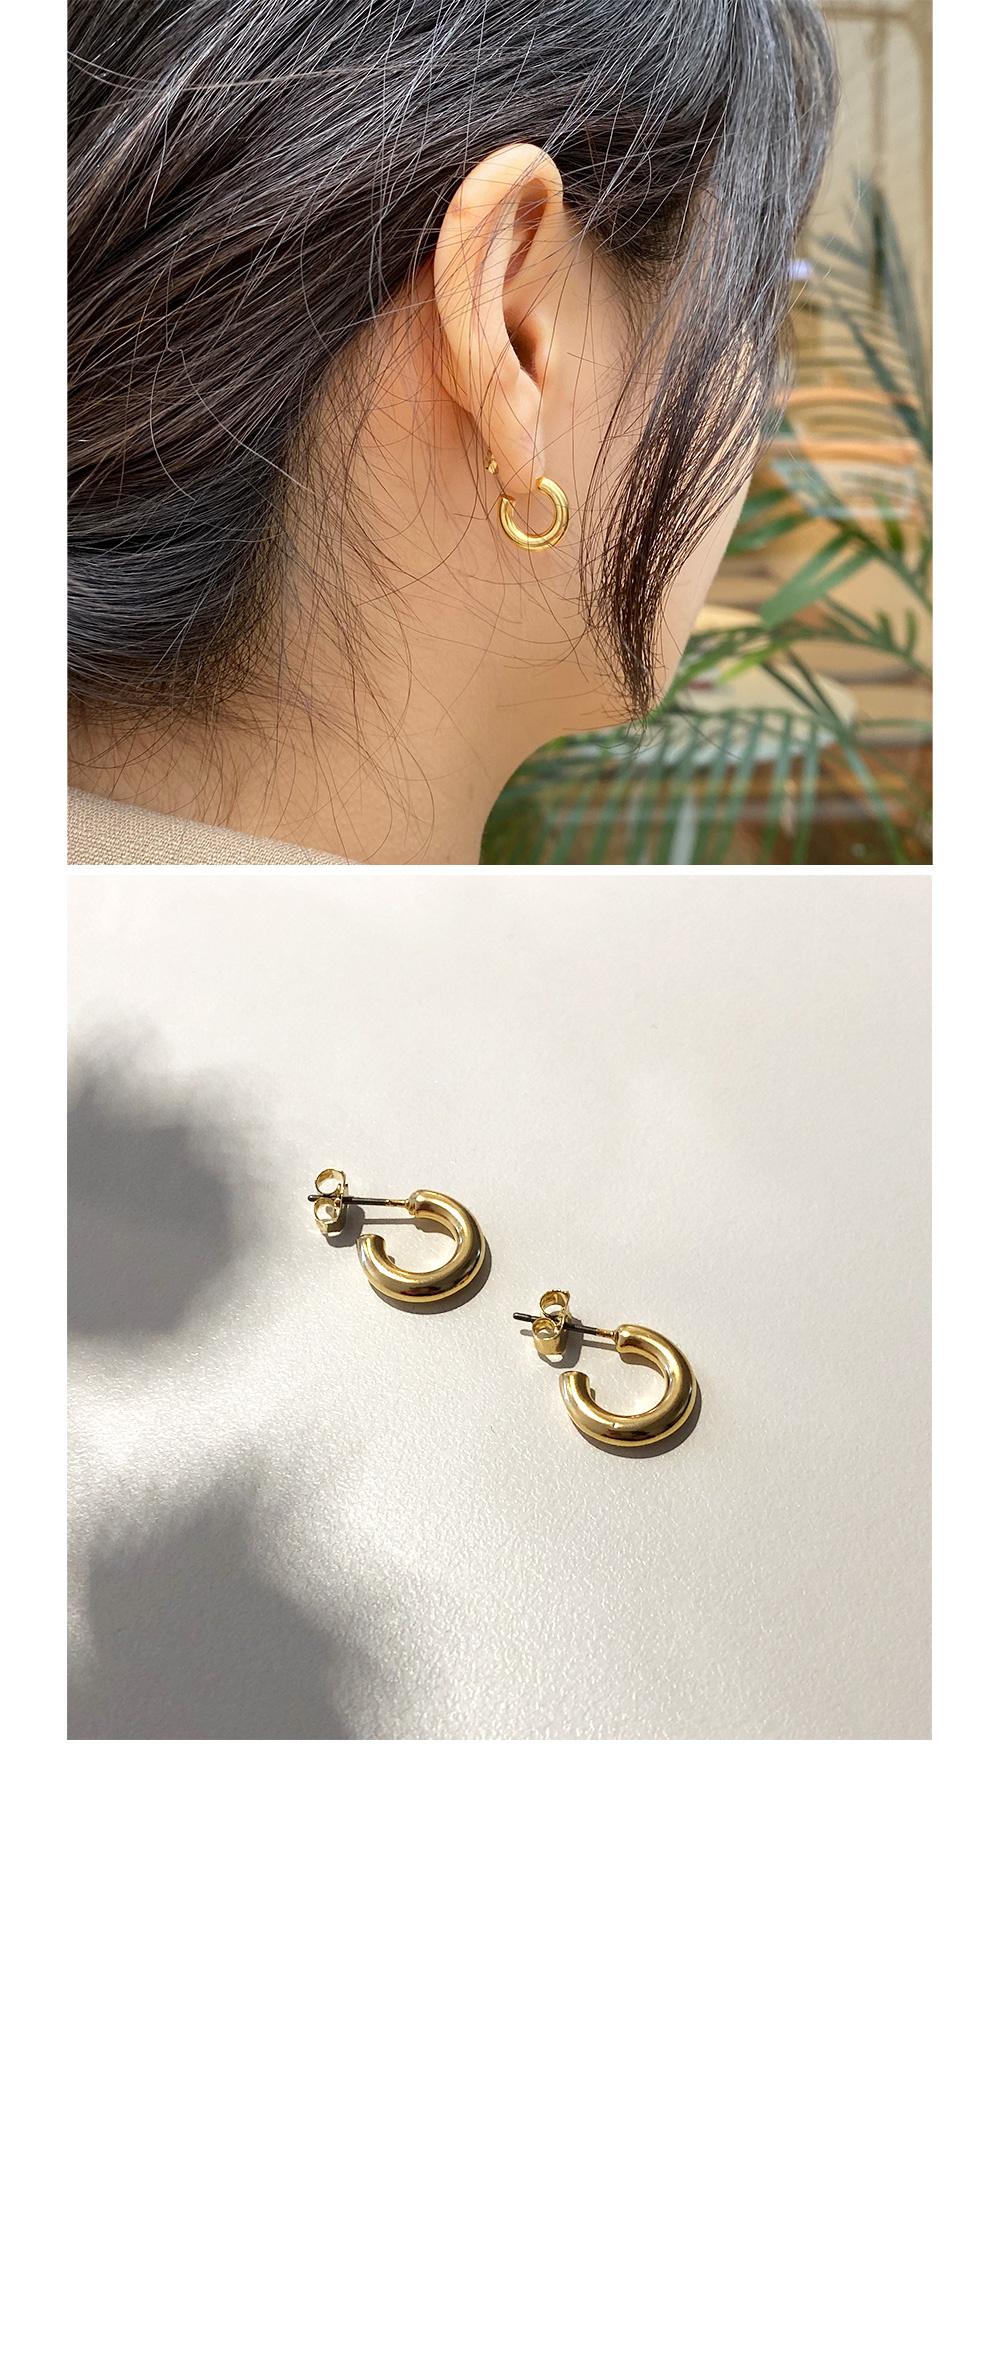 hold mini earrings